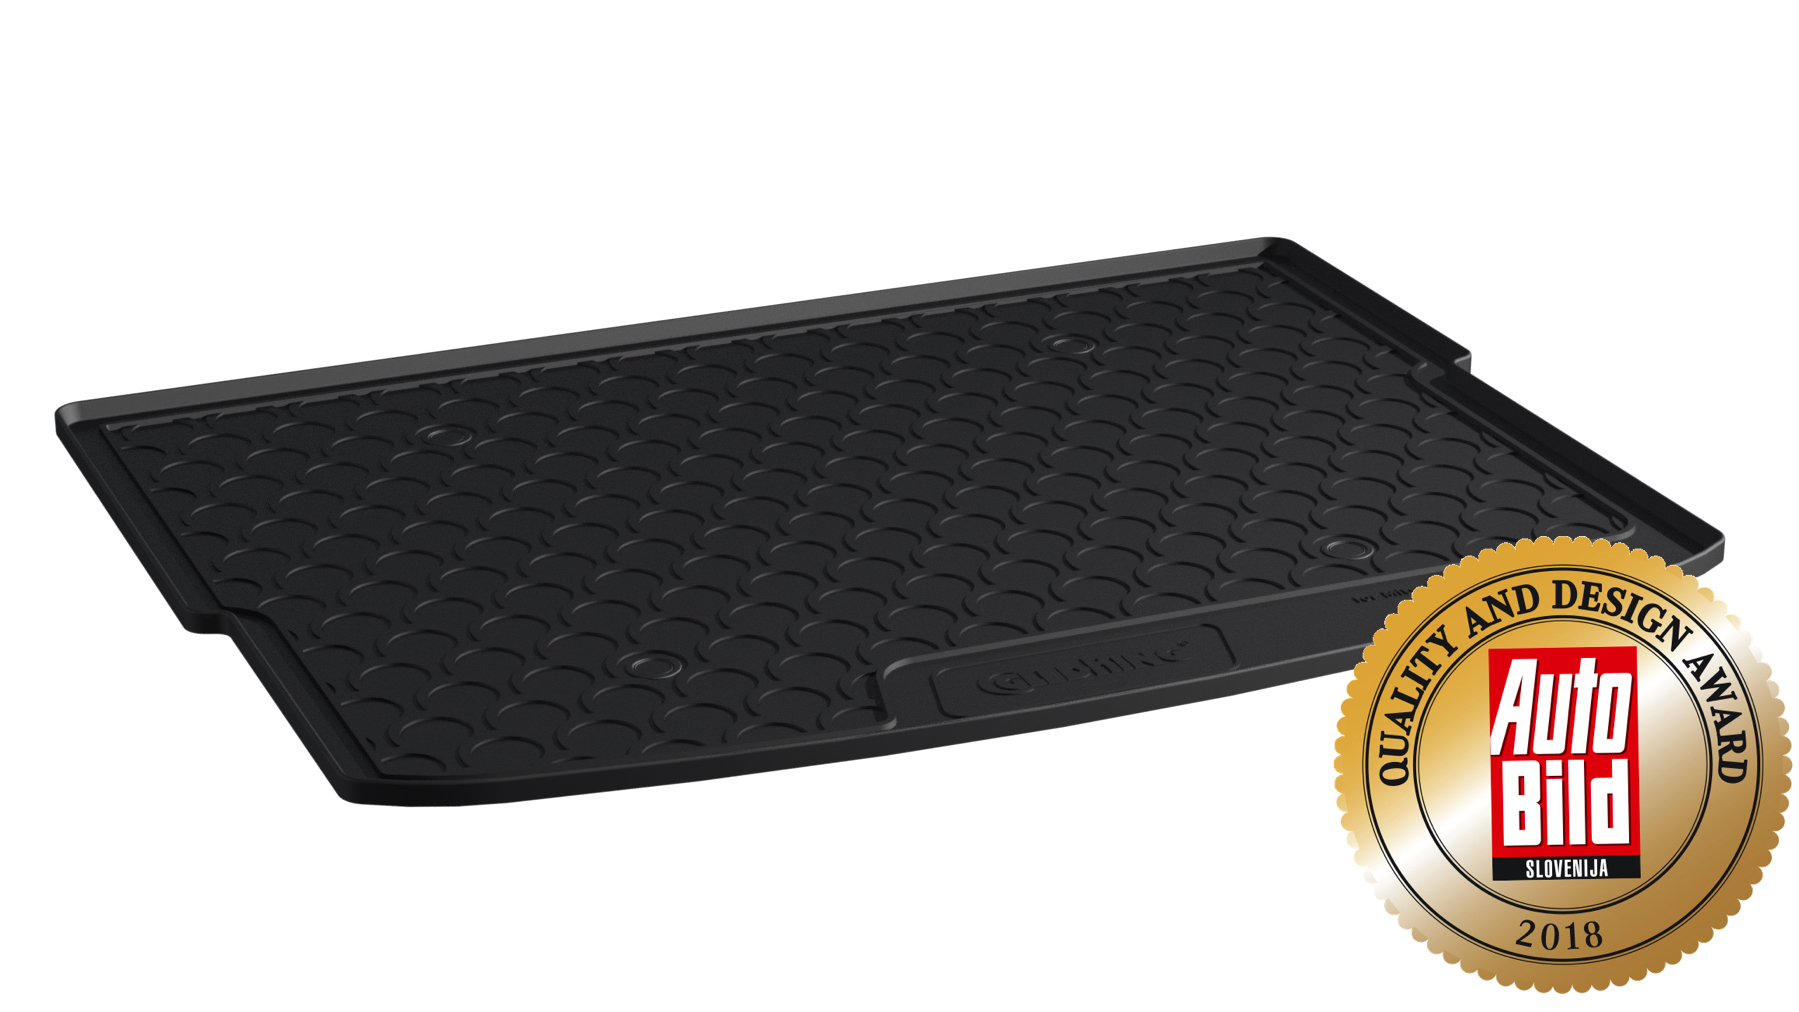 design gummi kofferraumwanne kofferraummatte skoda kodiaq. Black Bedroom Furniture Sets. Home Design Ideas